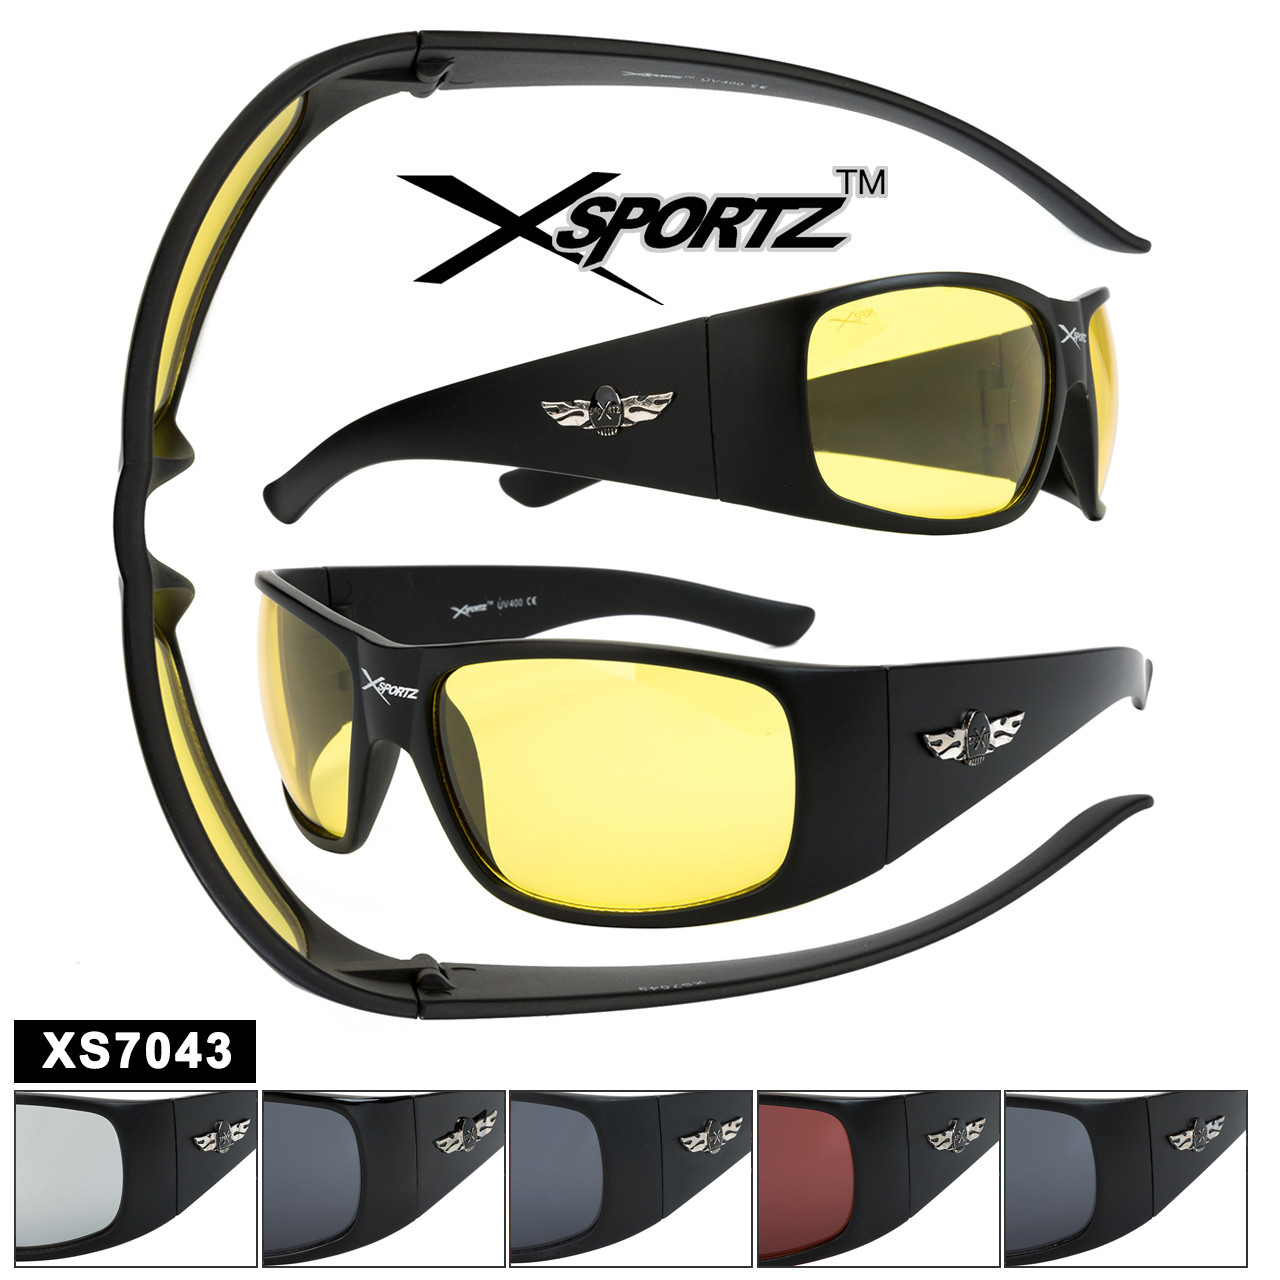 Bulk Sports Sunglasses - Style XS7043 (Assorted Colors) (12 pcs.)